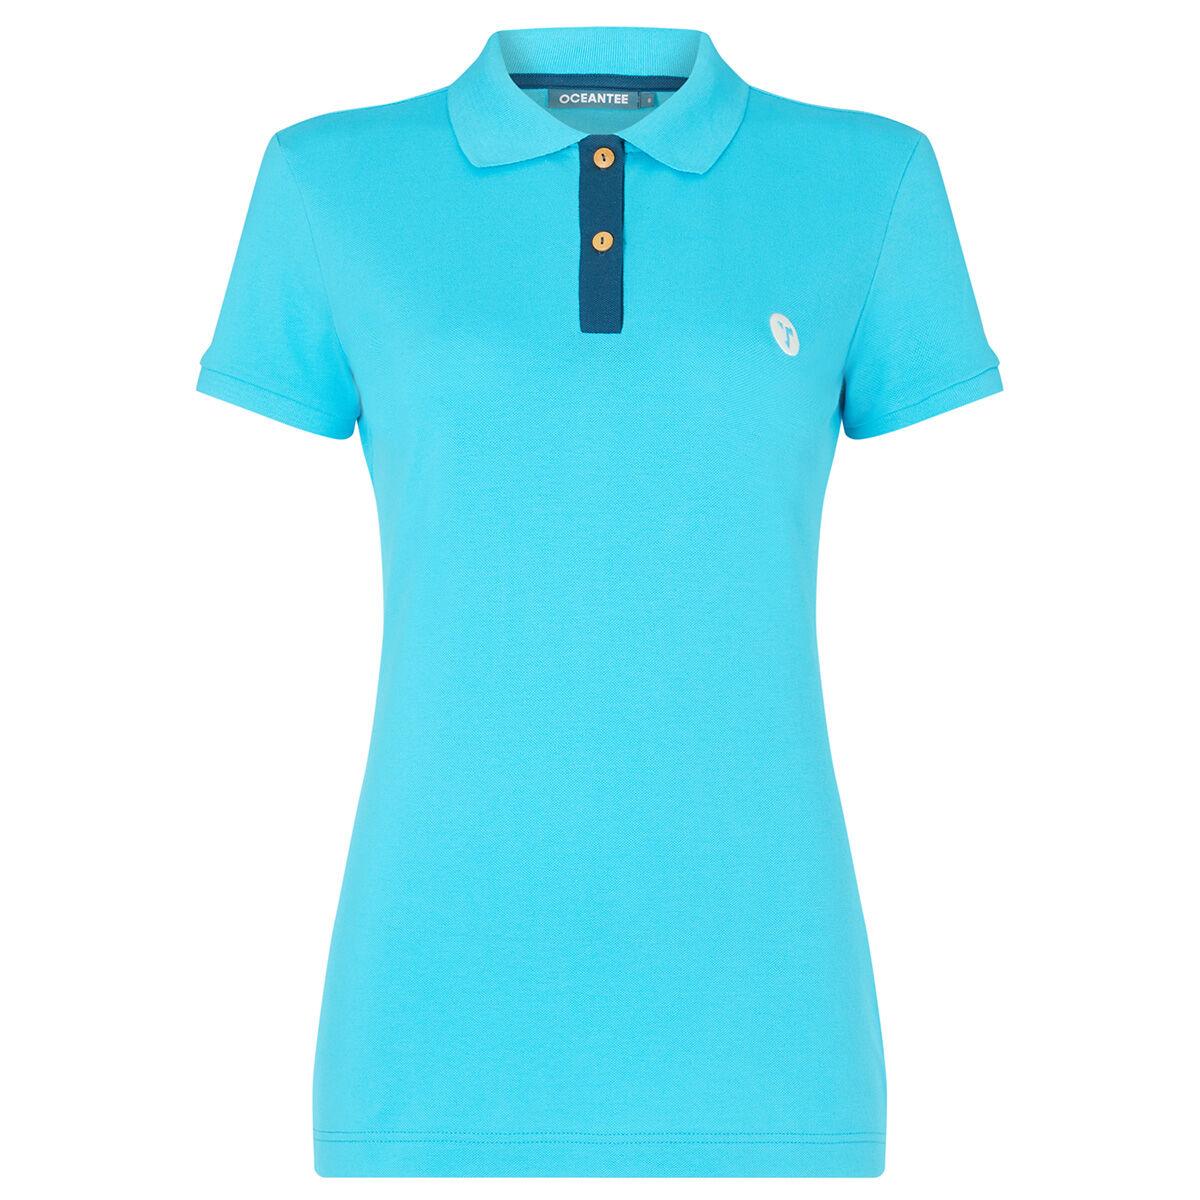 Ocean Tee Mako Womens Golf Polo Shirt, Female, Aqua, Large | American Golf